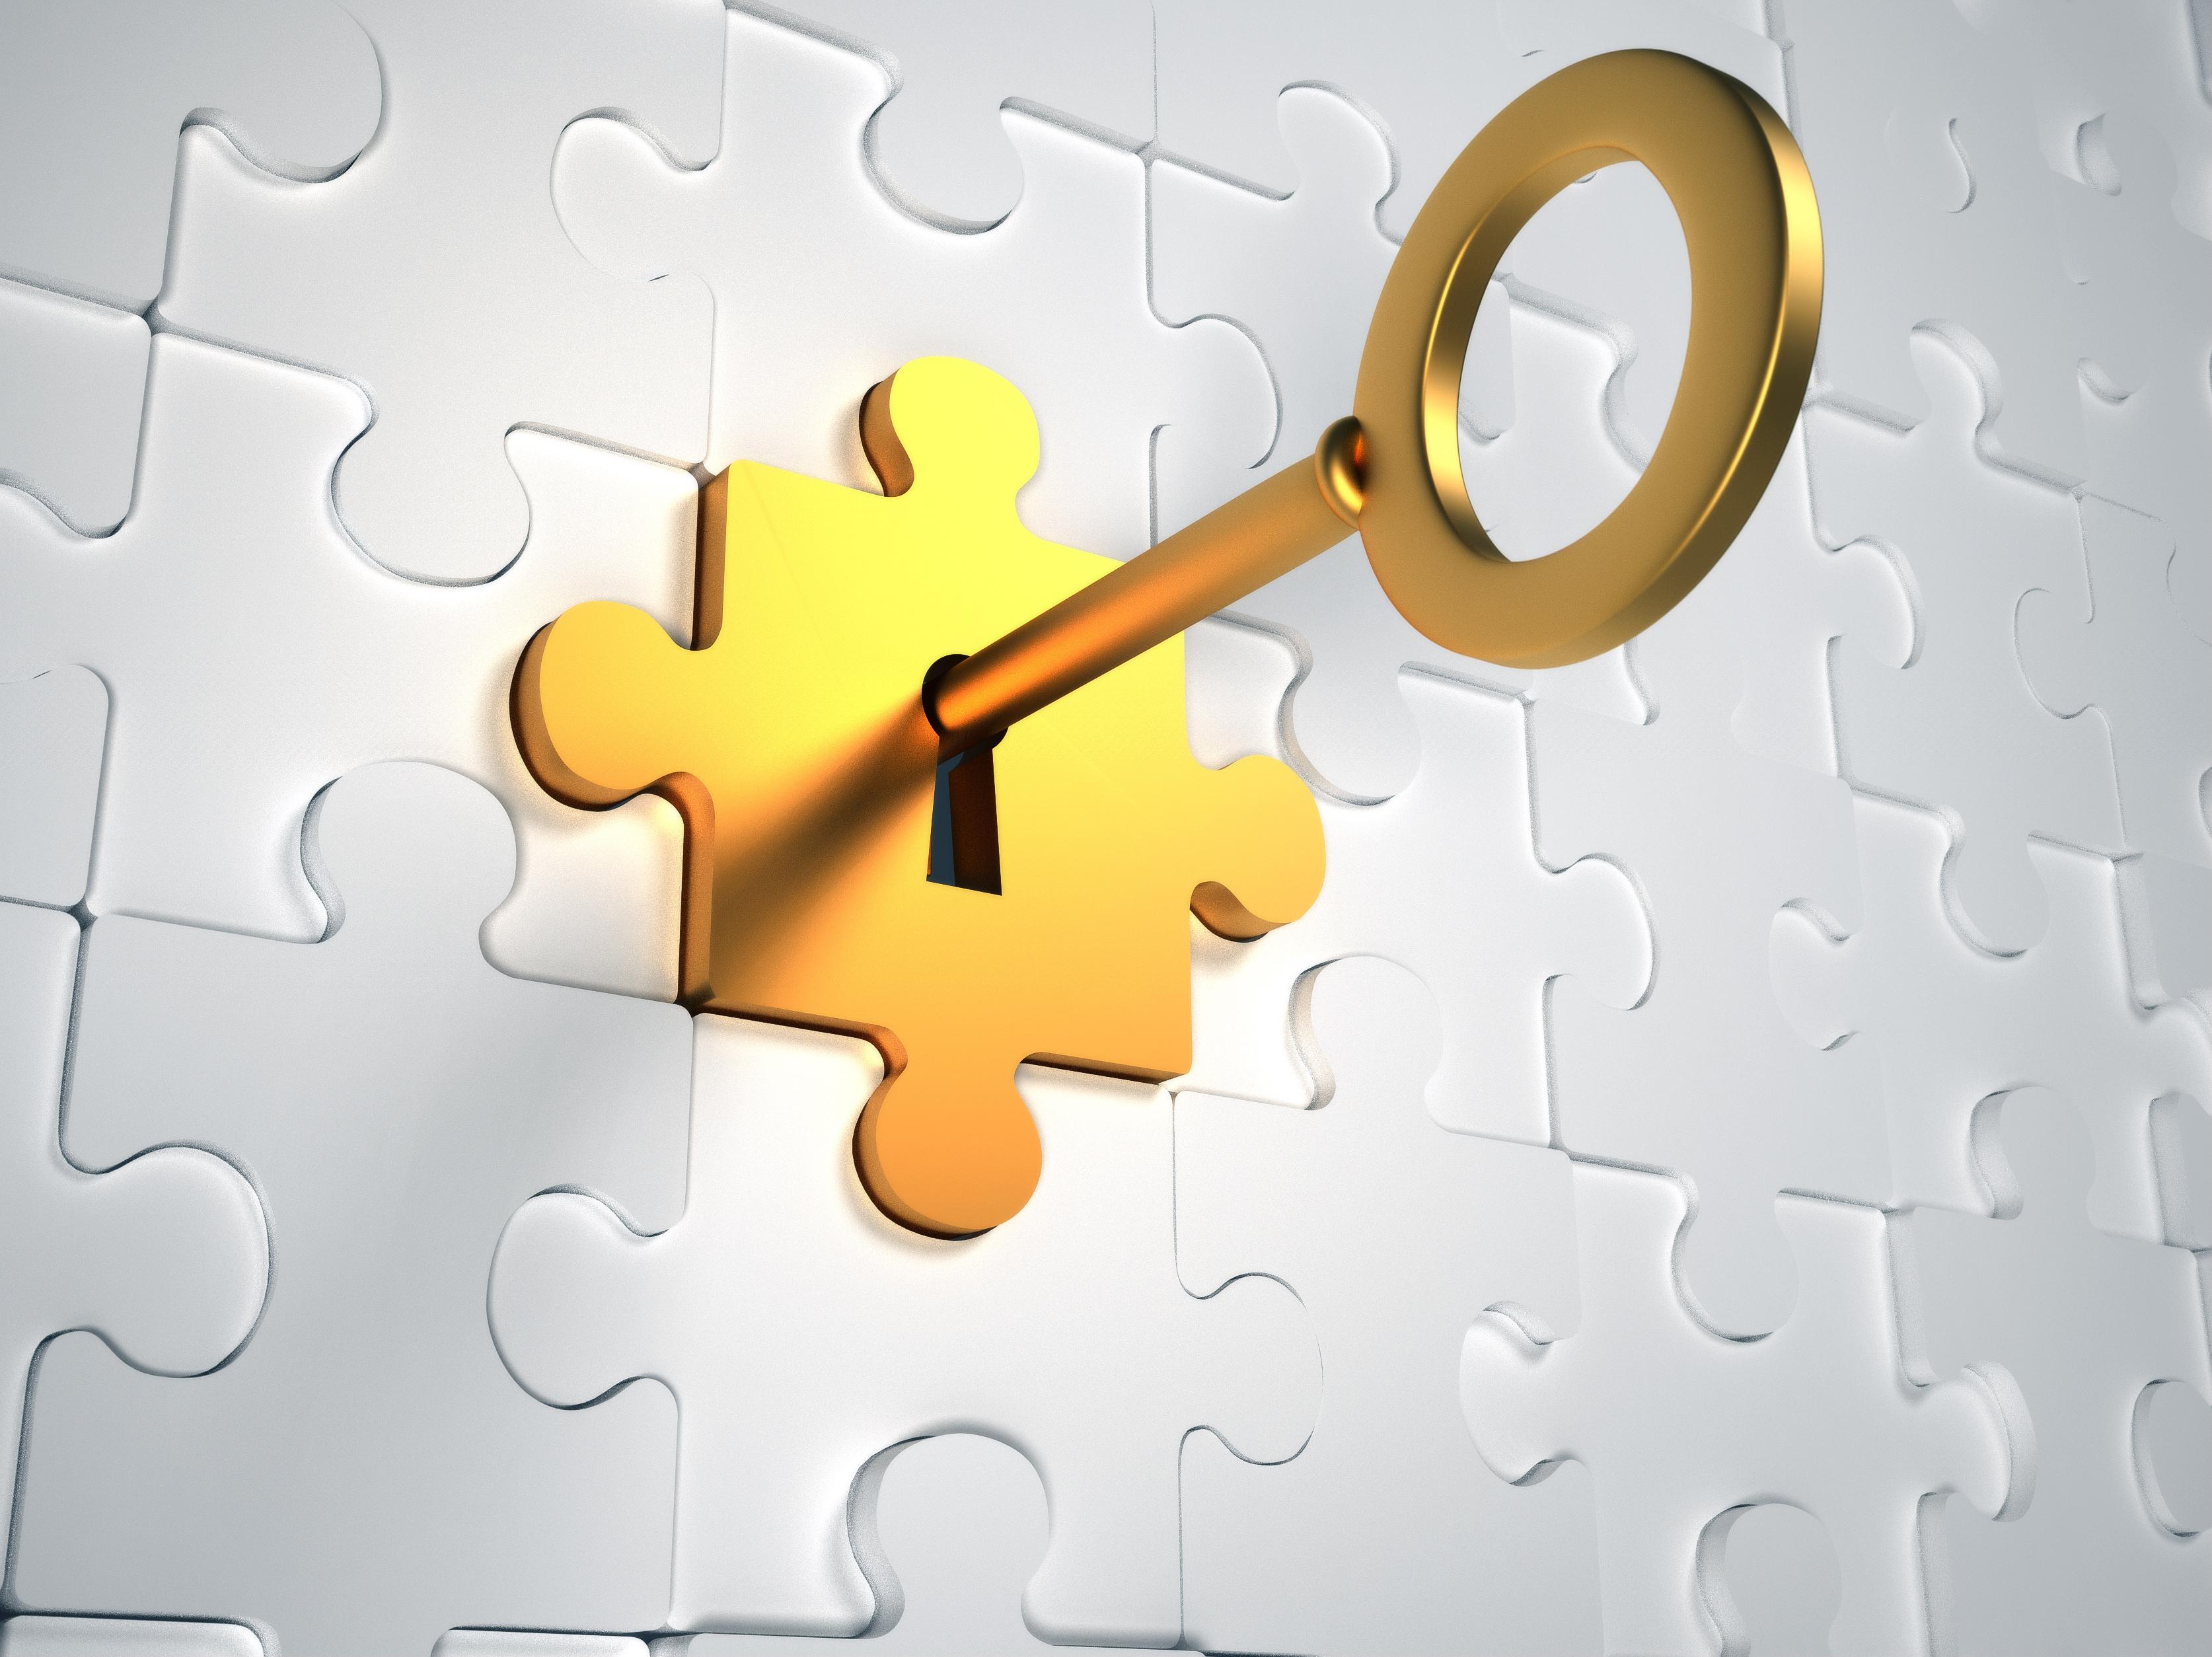 privatekey-秘密鍵-publickey-公開鍵